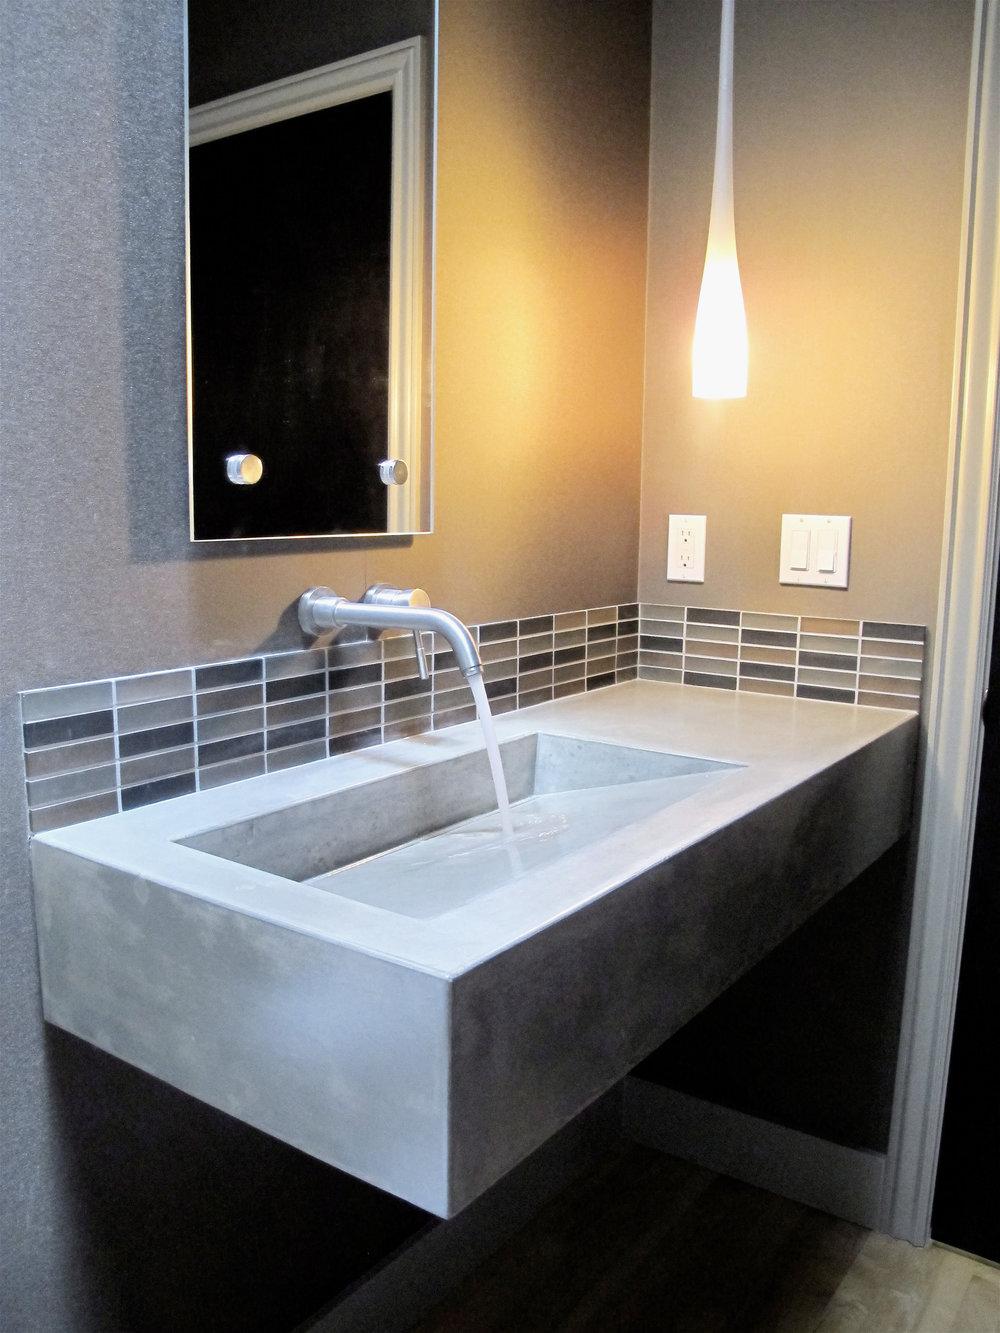 Residential Custom Ramp Sink